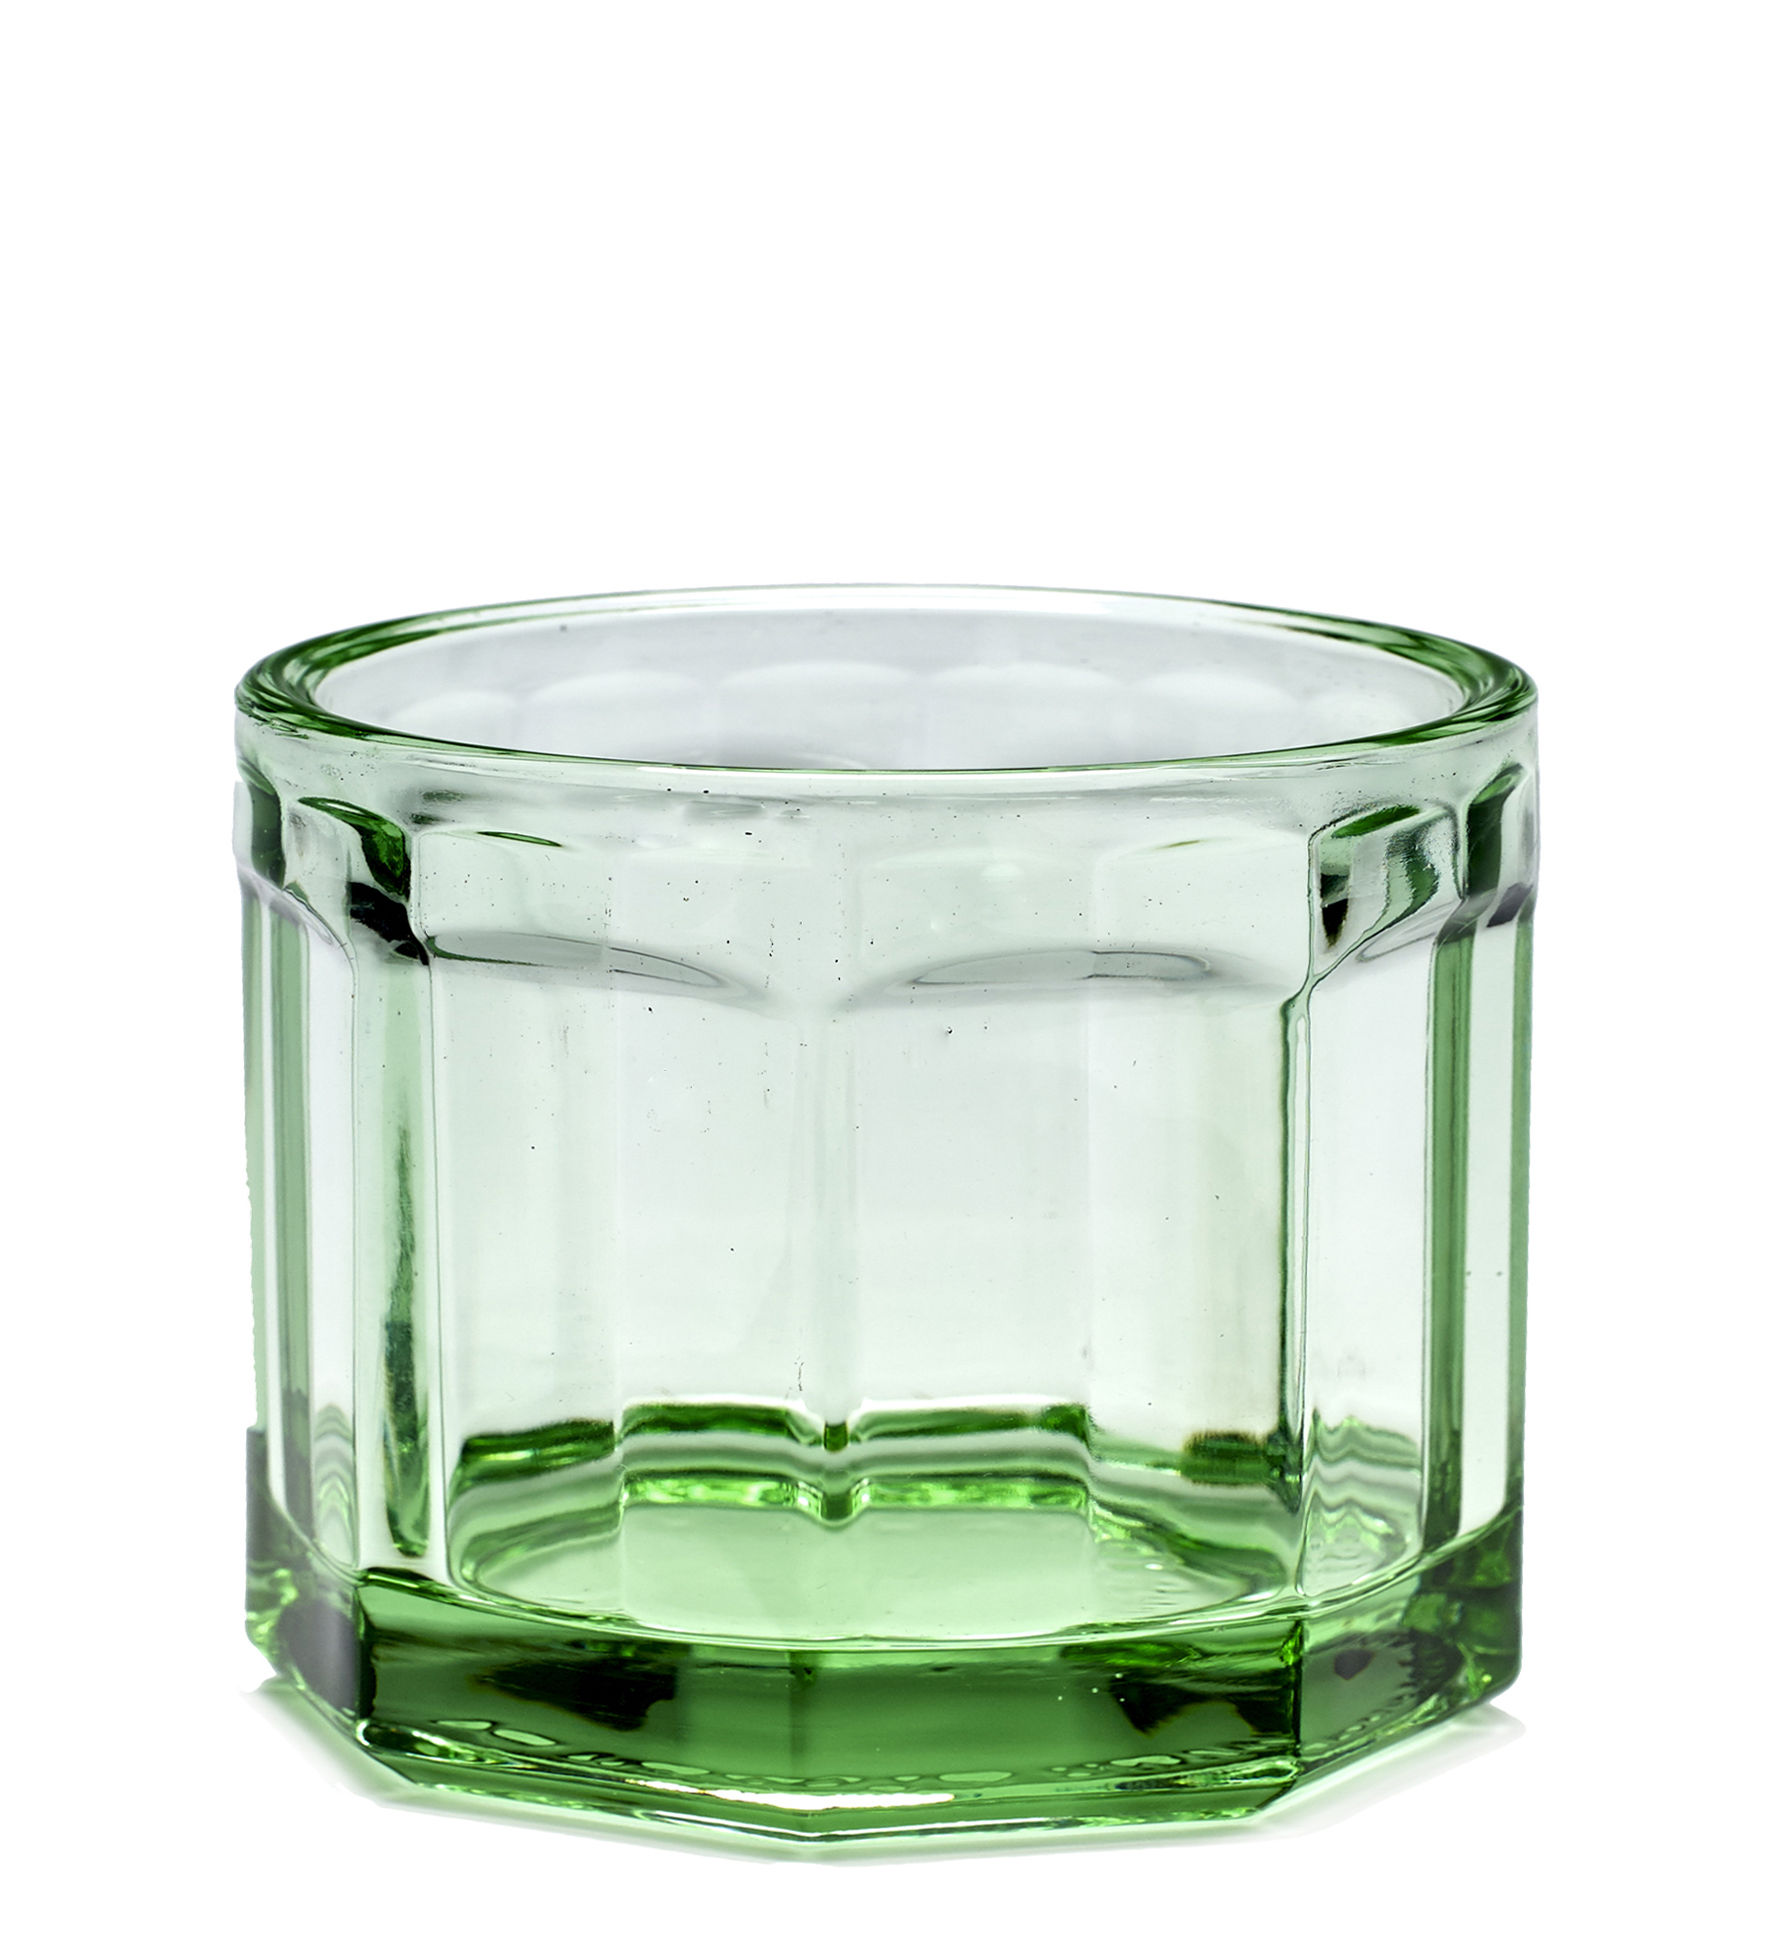 Tableware - Wine Glasses & Glassware - Fish & Fish Small Glass - 16 cl by Serax - Transparent green - Pressed glass